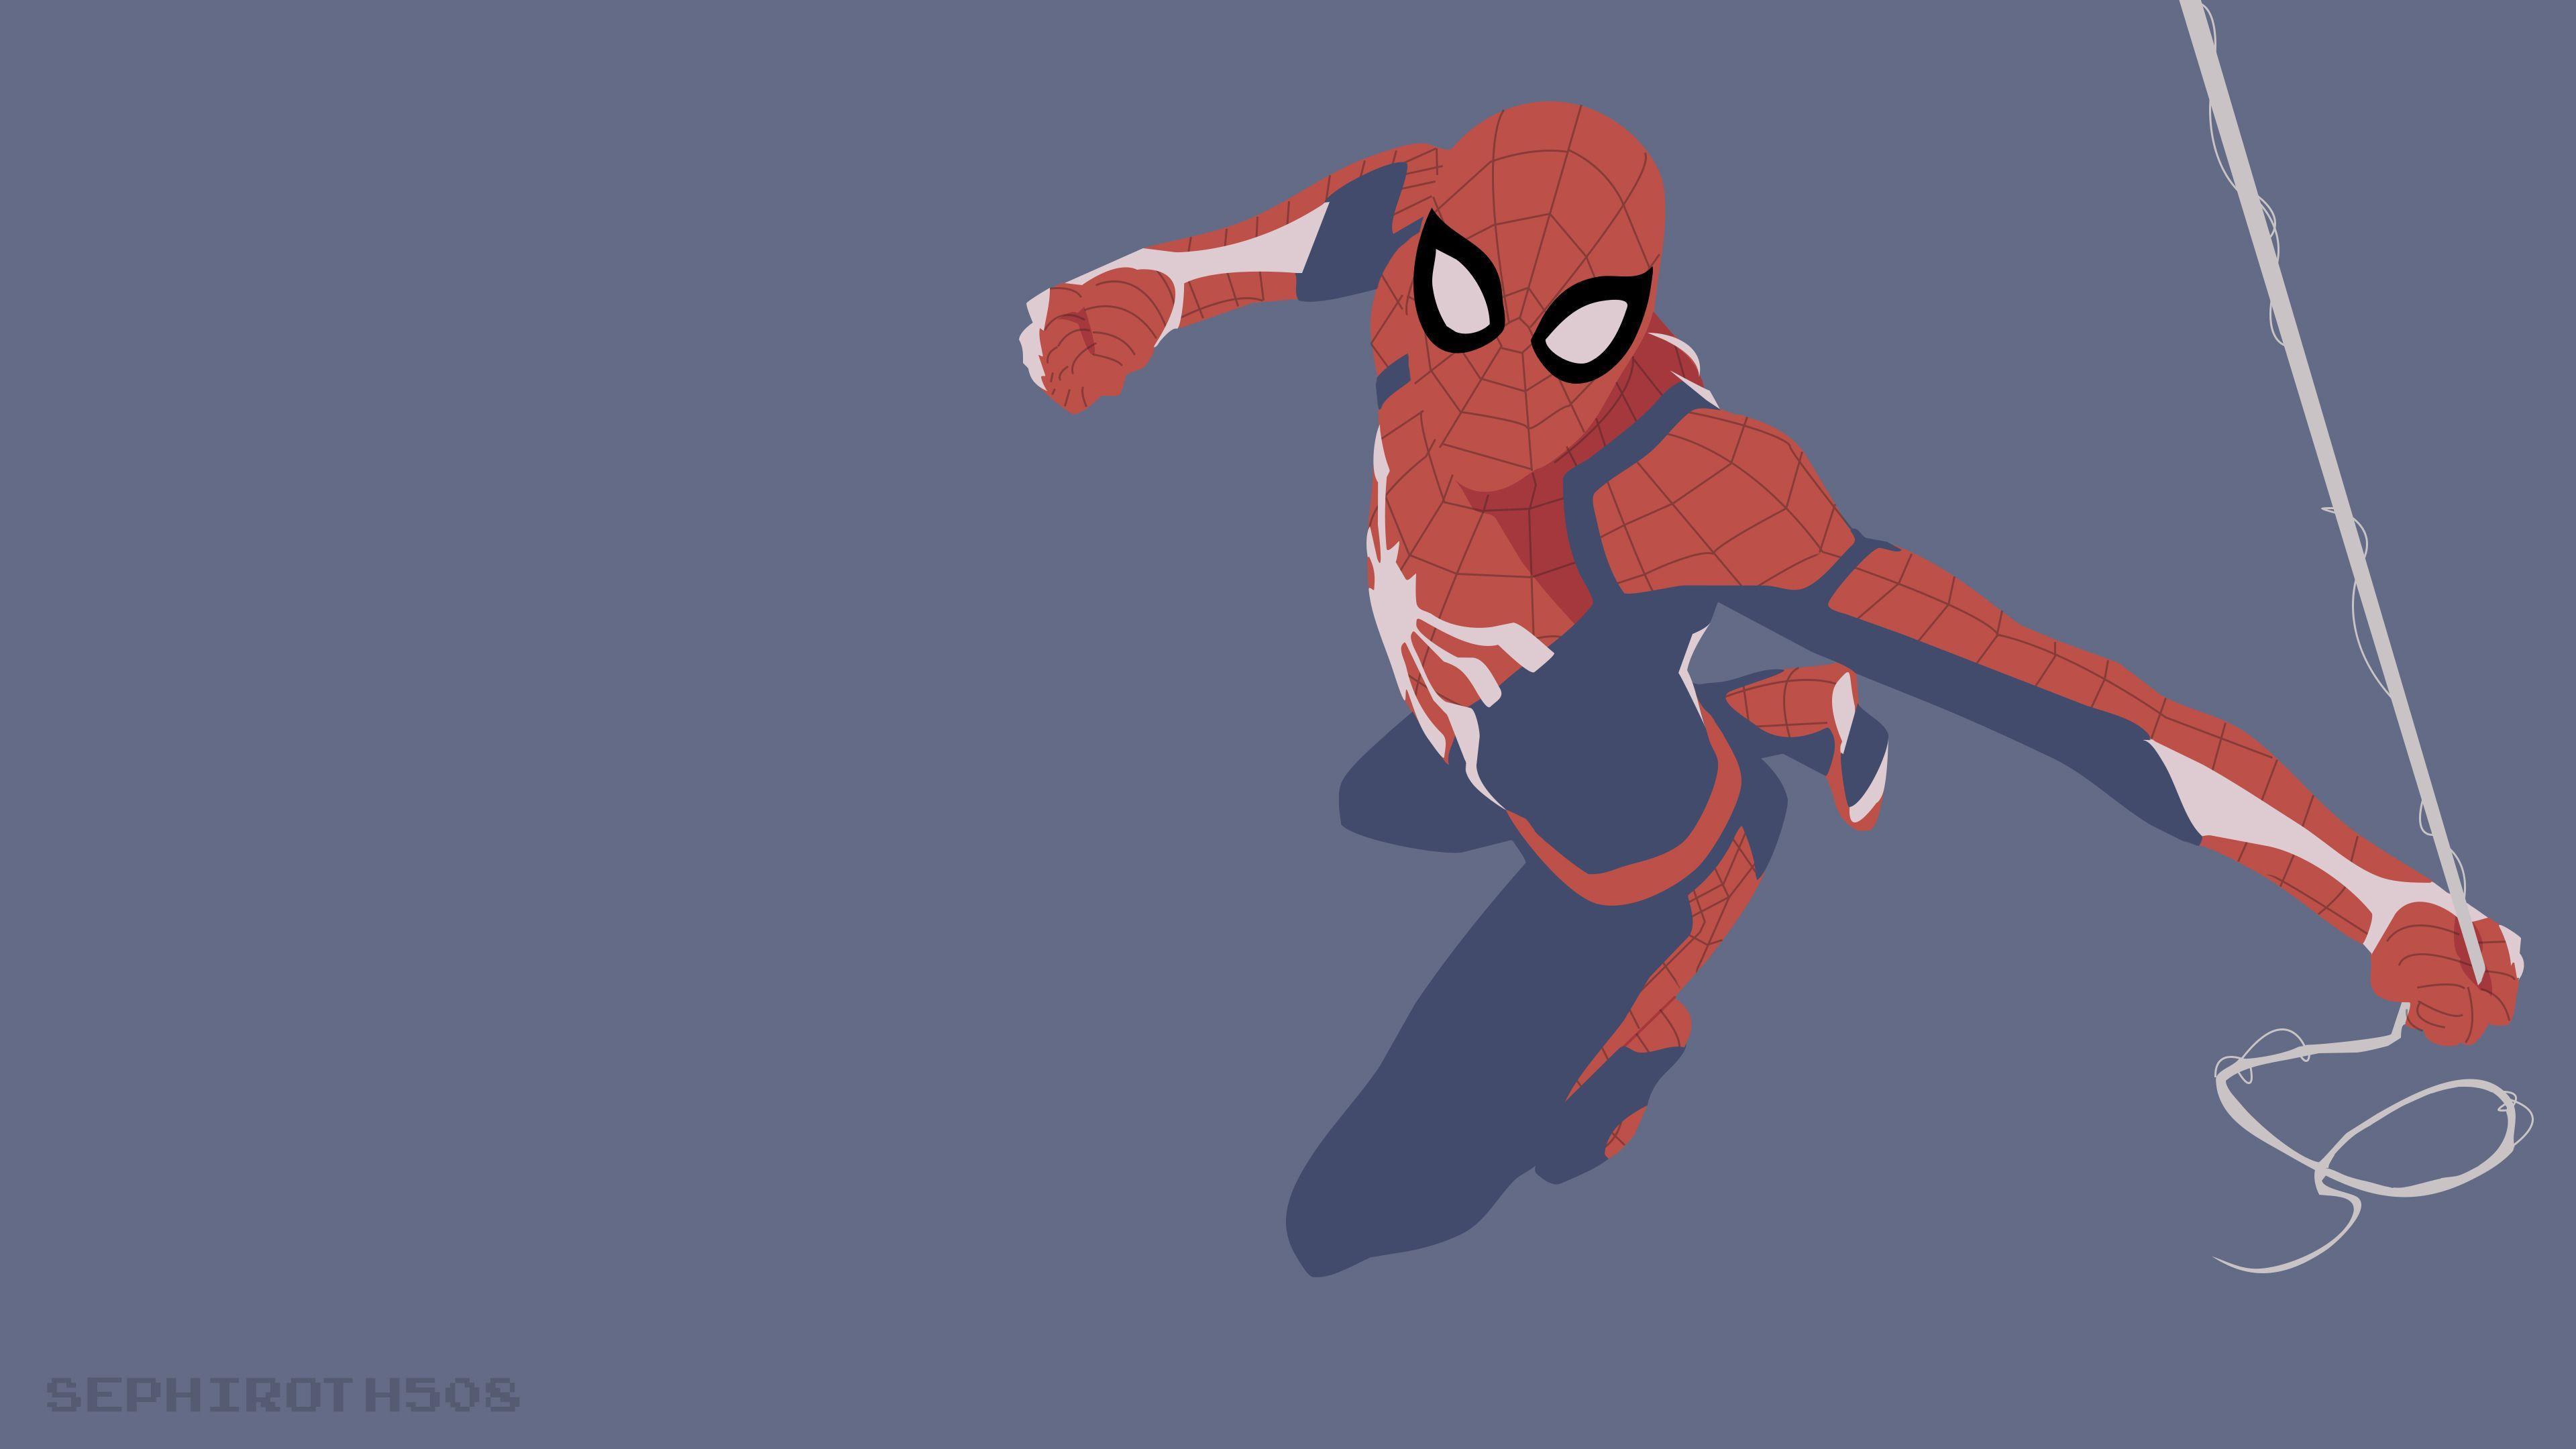 Spider-Man Minimalist Wallpapers - Top ...